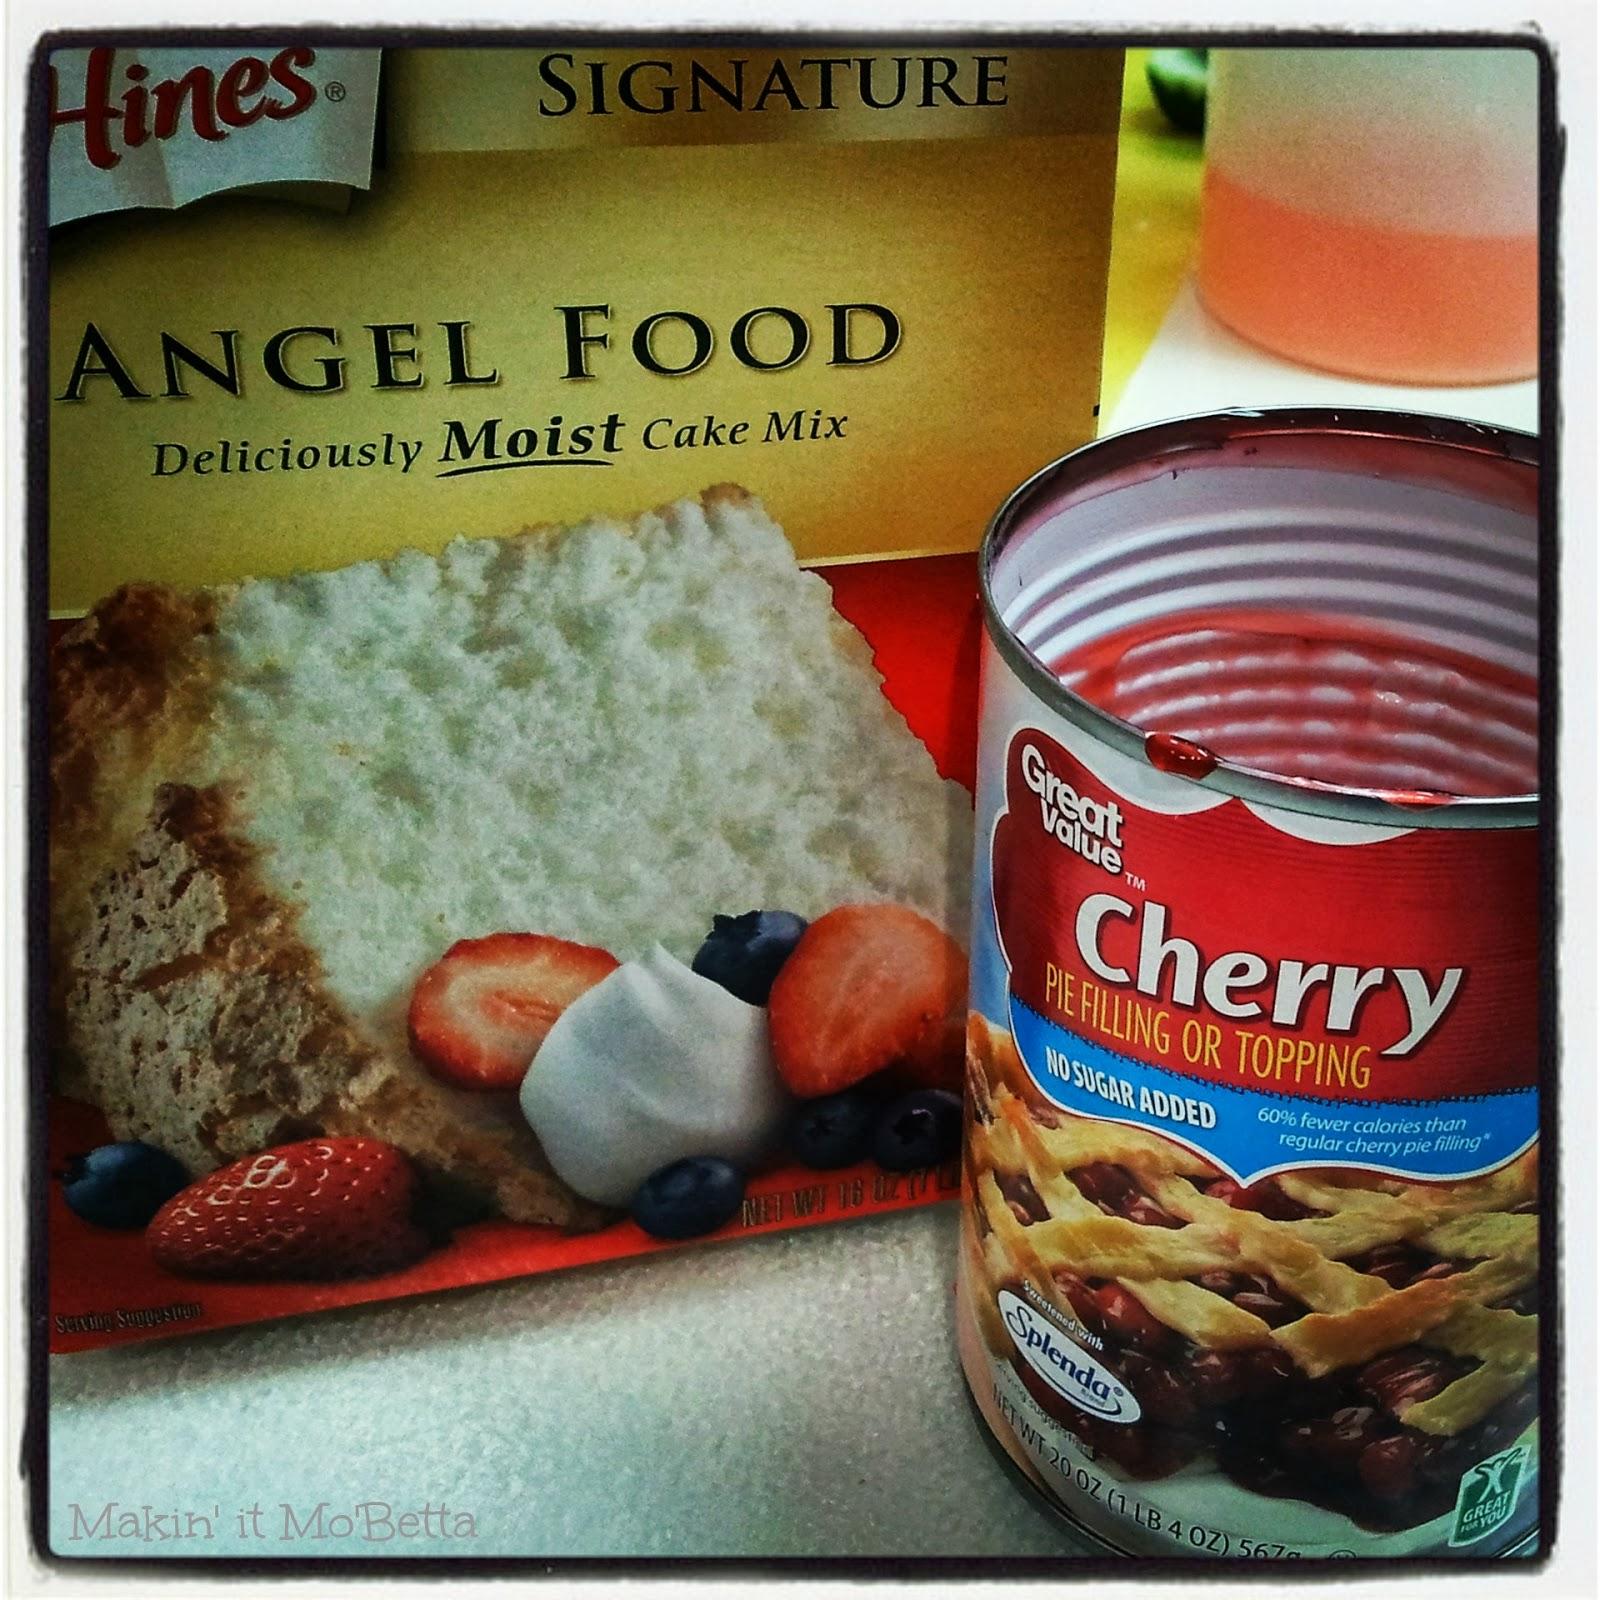 Angel food cake day recipes makin it mobetta angel food cake day recipes forumfinder Image collections